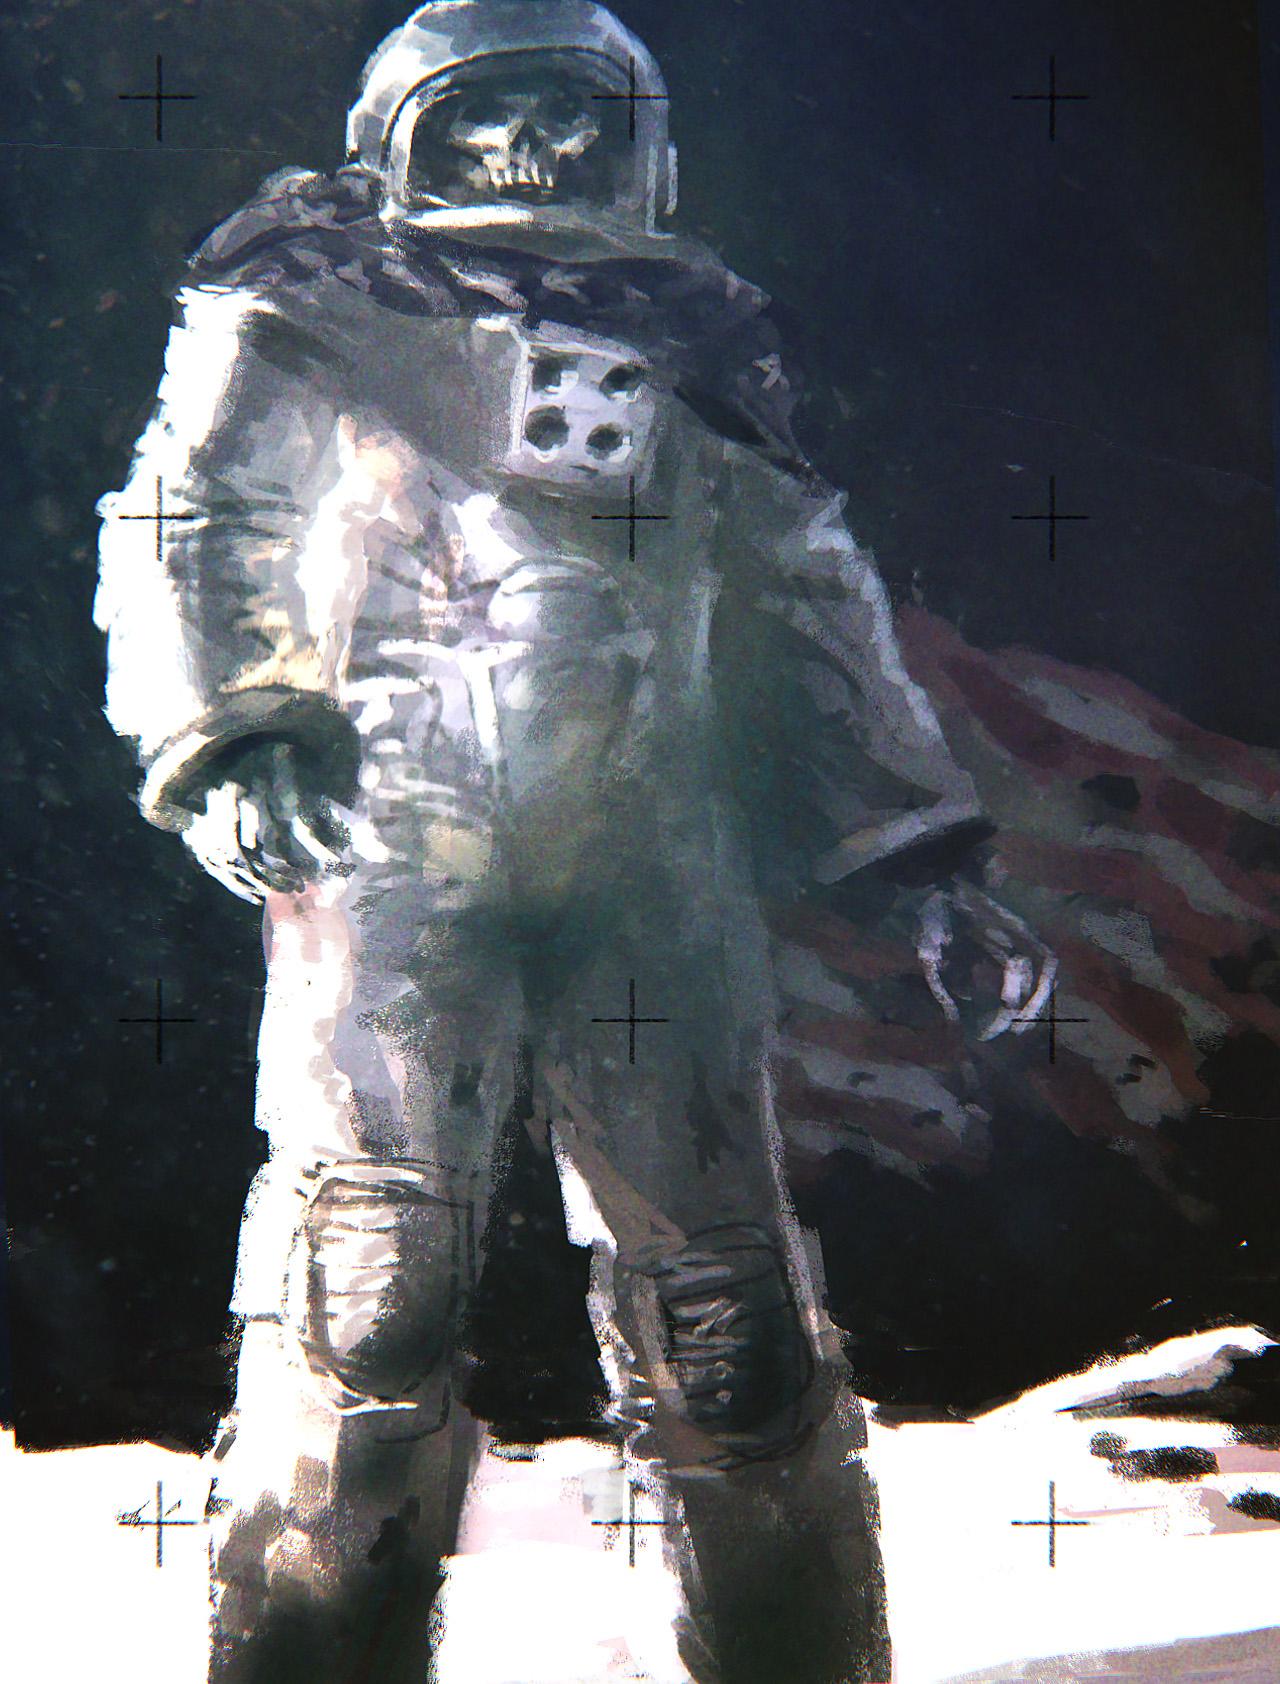 Moonchild 1310224 1 958a6735 ew6z